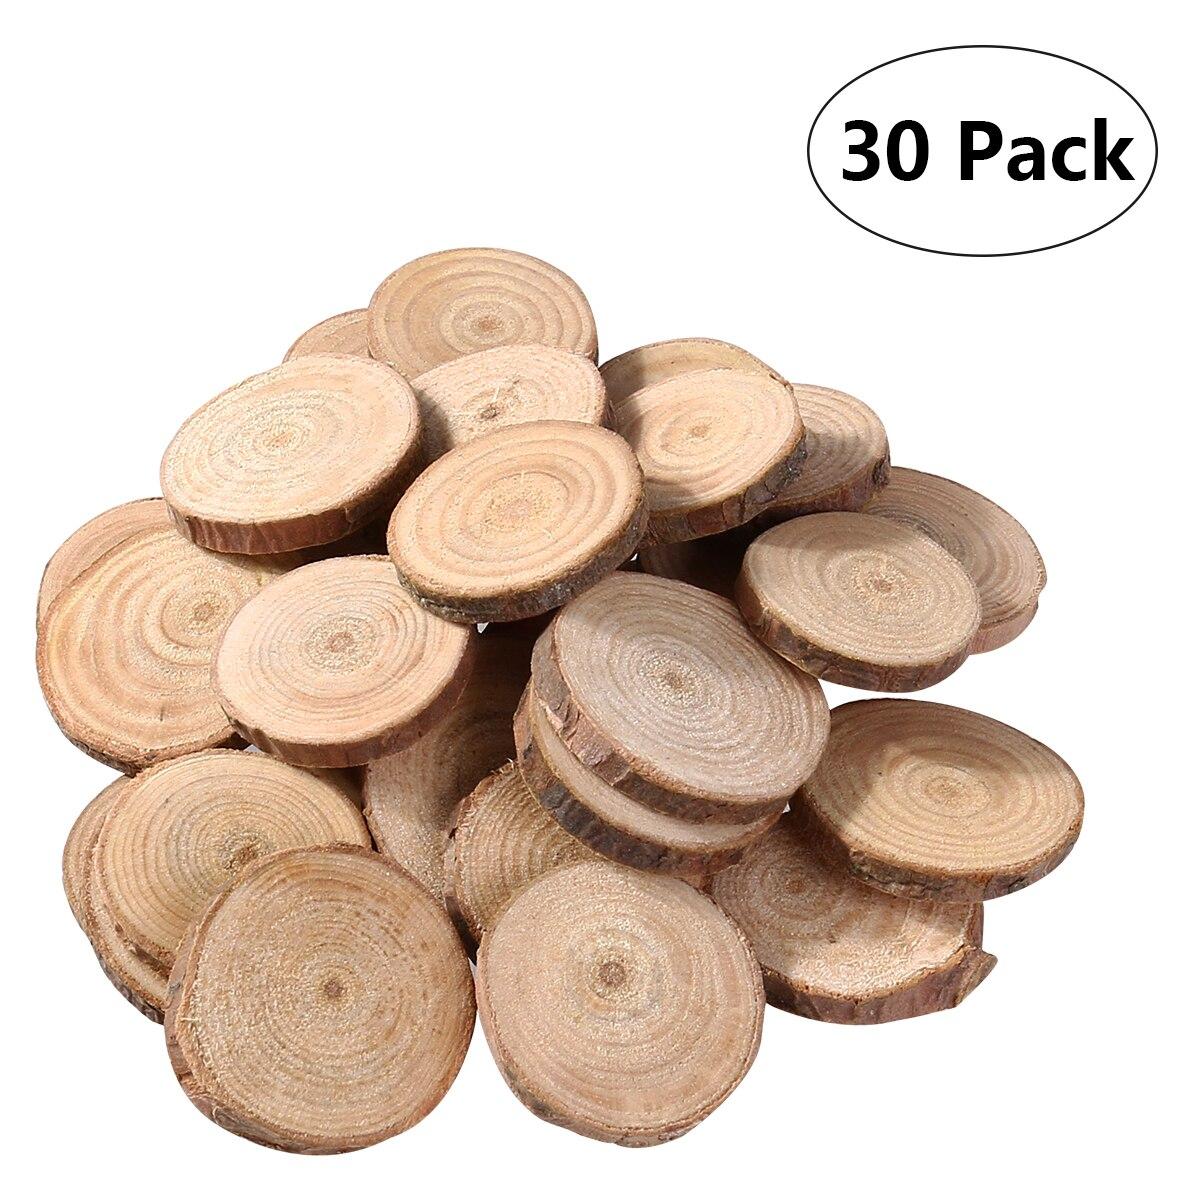 Unicoco Wooden Log Stick 100Pcs DIY Craft Photo Prop Home Garden DIY Table Decoration Party Supplies Log Stick